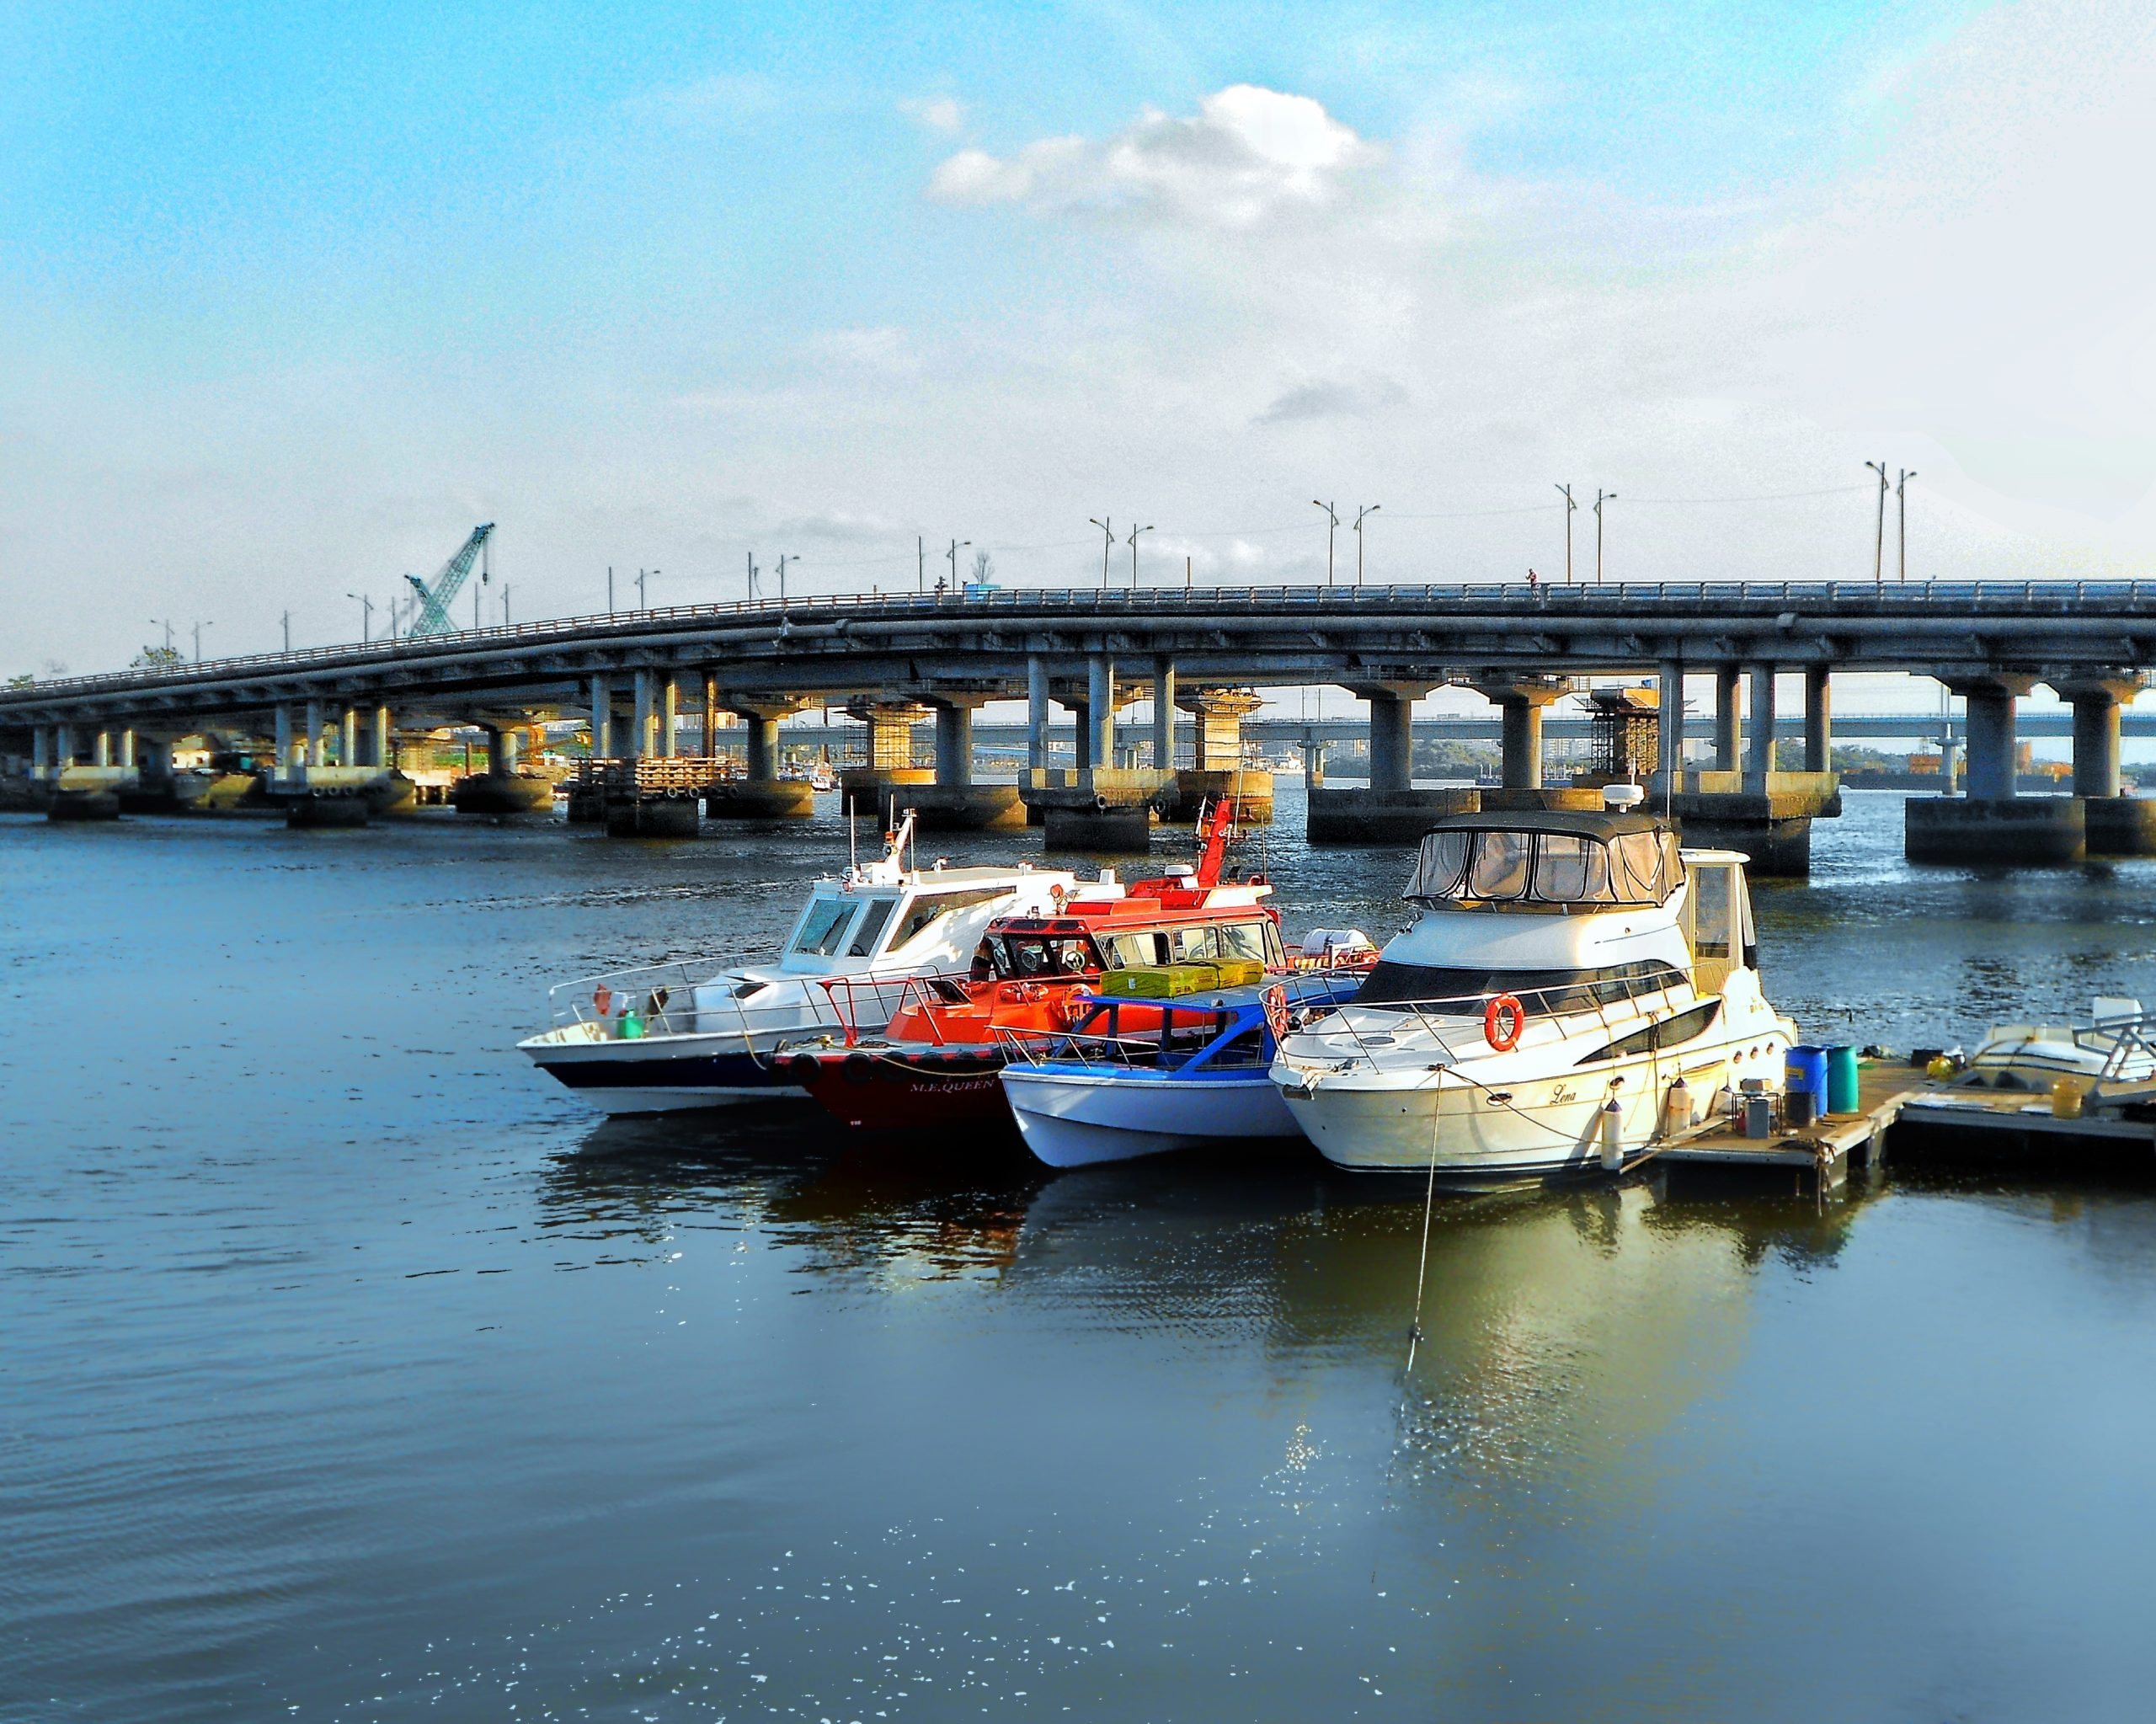 Watercraft and a Bridge